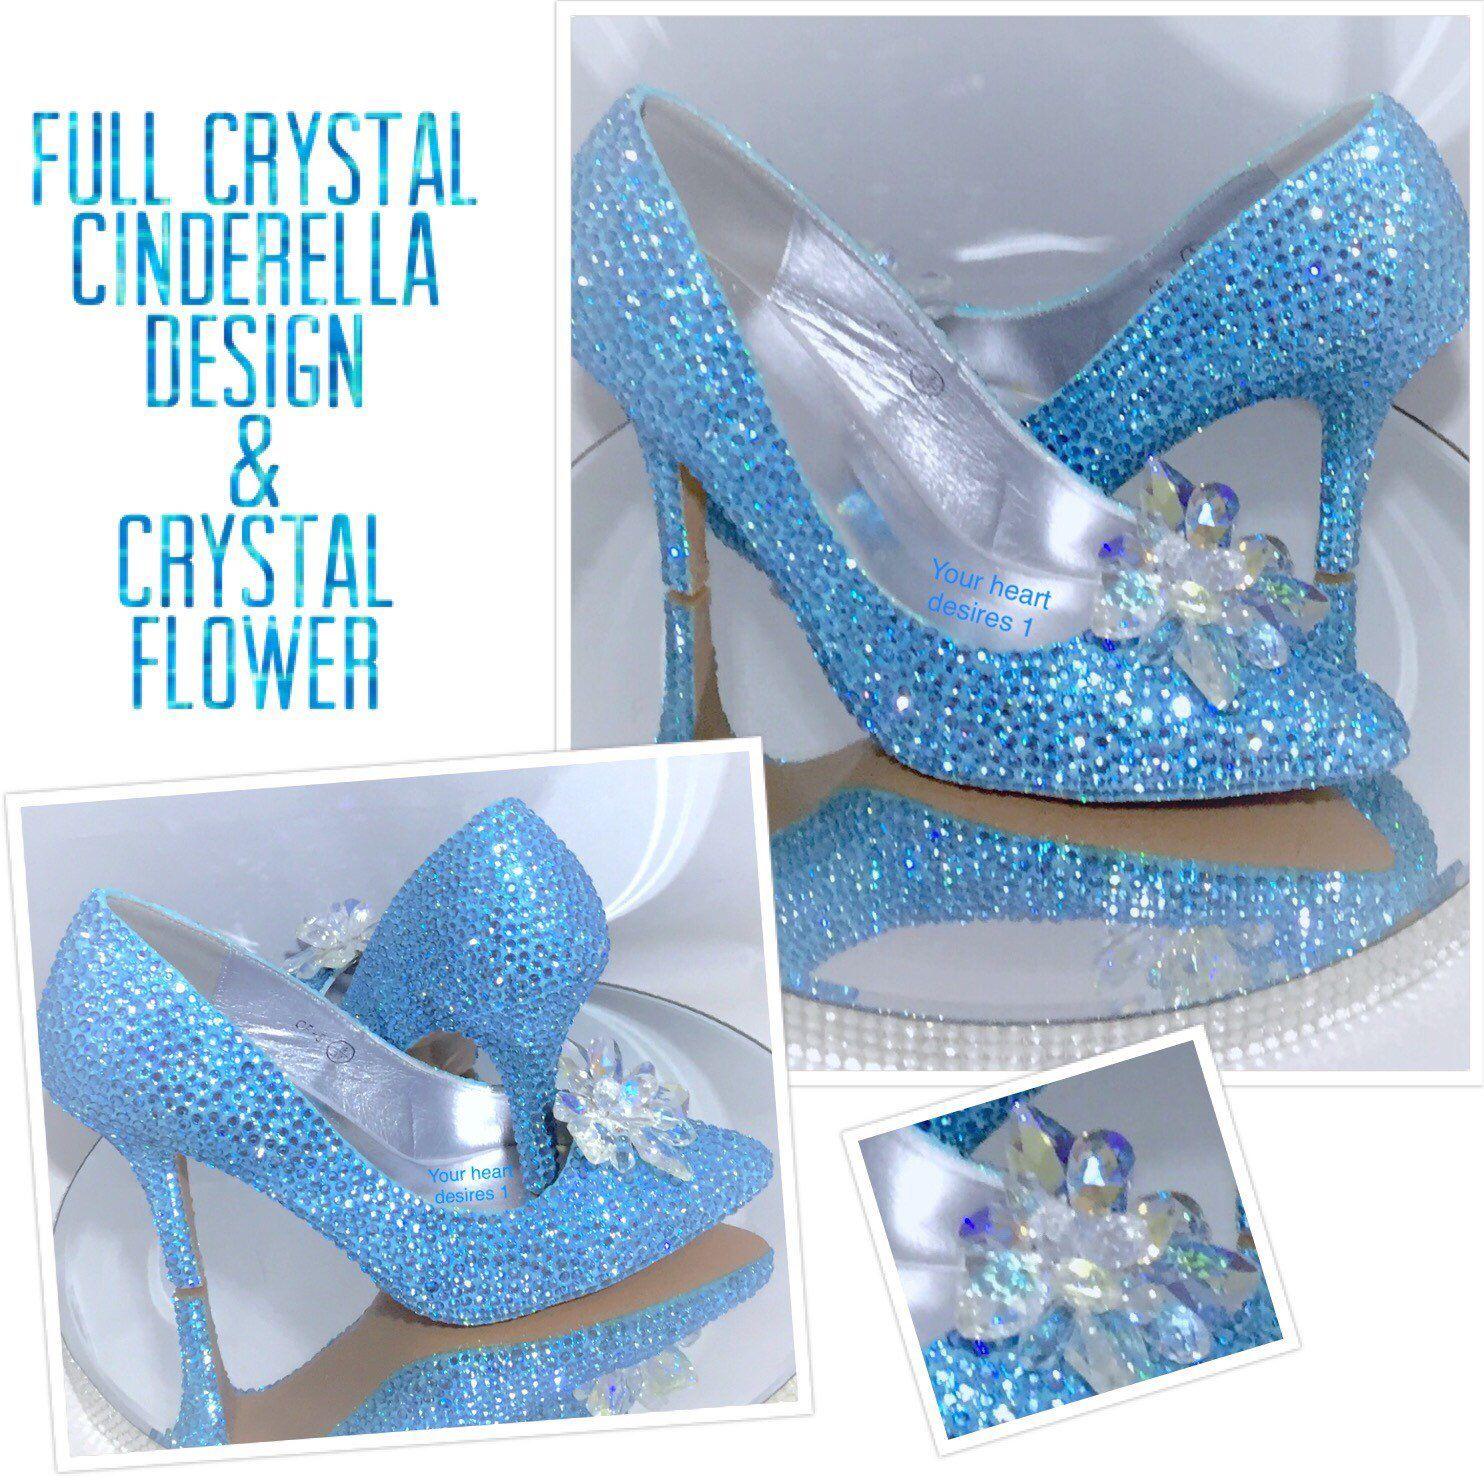 Swarovski style shoes blue Cinderella pumps wedding bridal